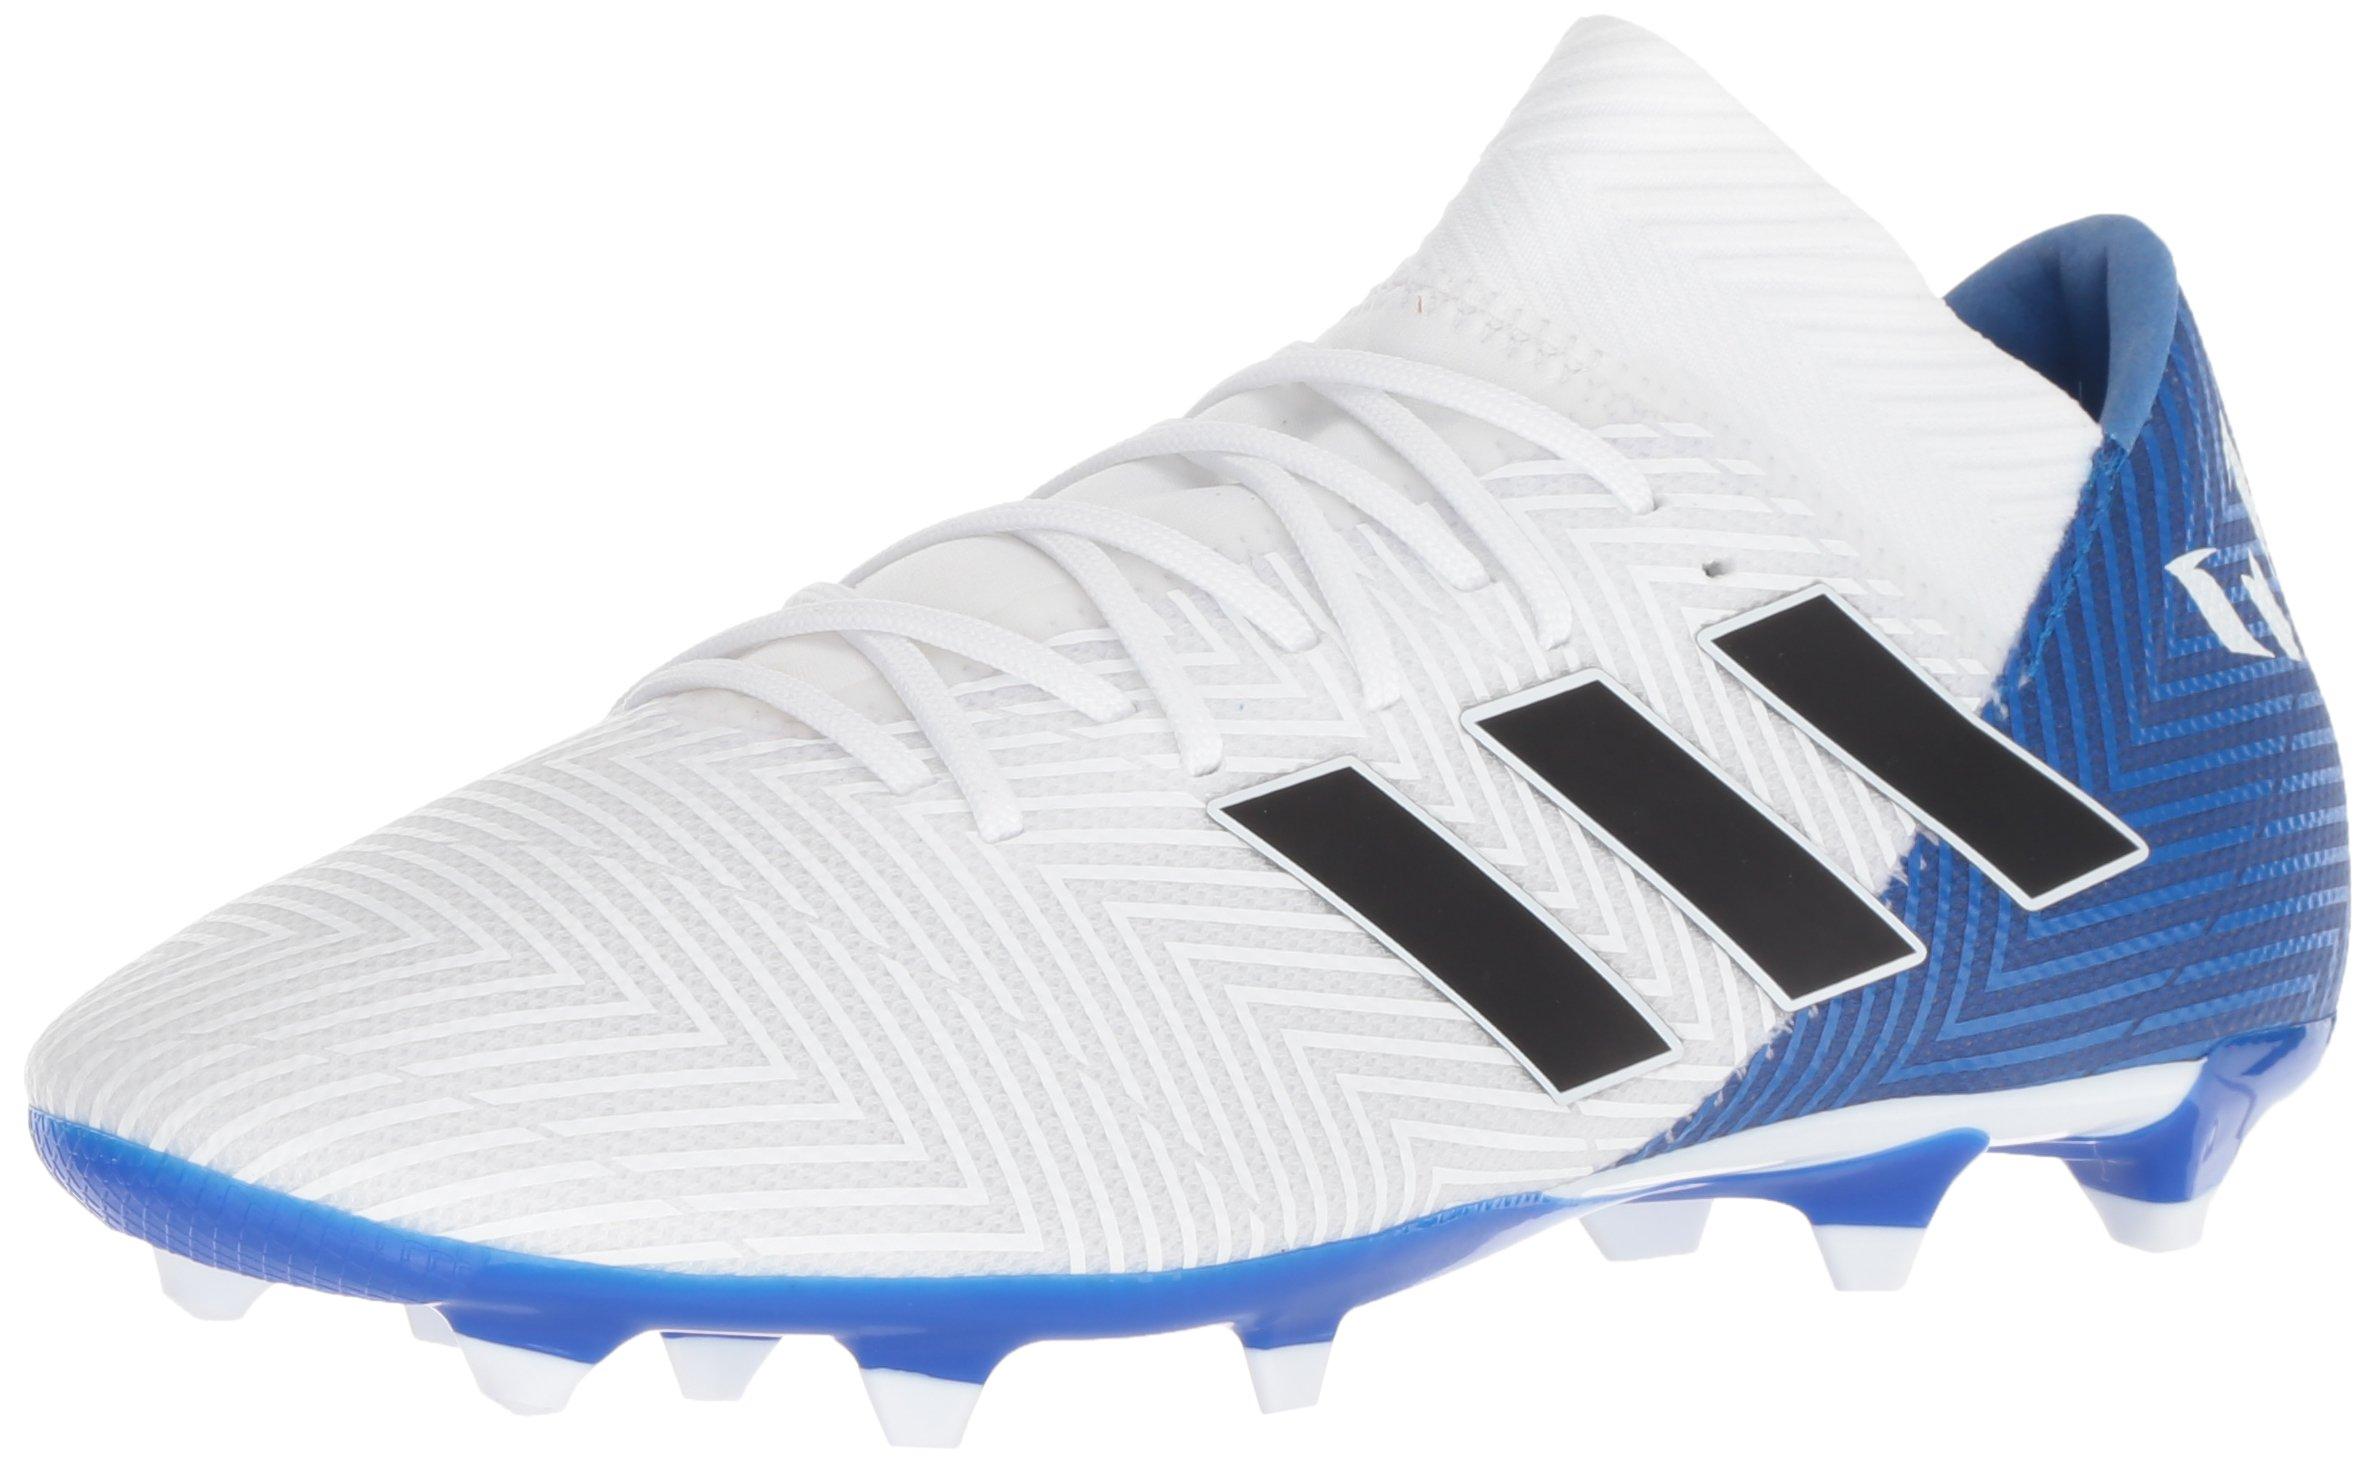 adidas Men's Nemeziz Messi 18.3 Firm Ground Soccer Shoe, White/Black/Football Blue, 6.5 M US